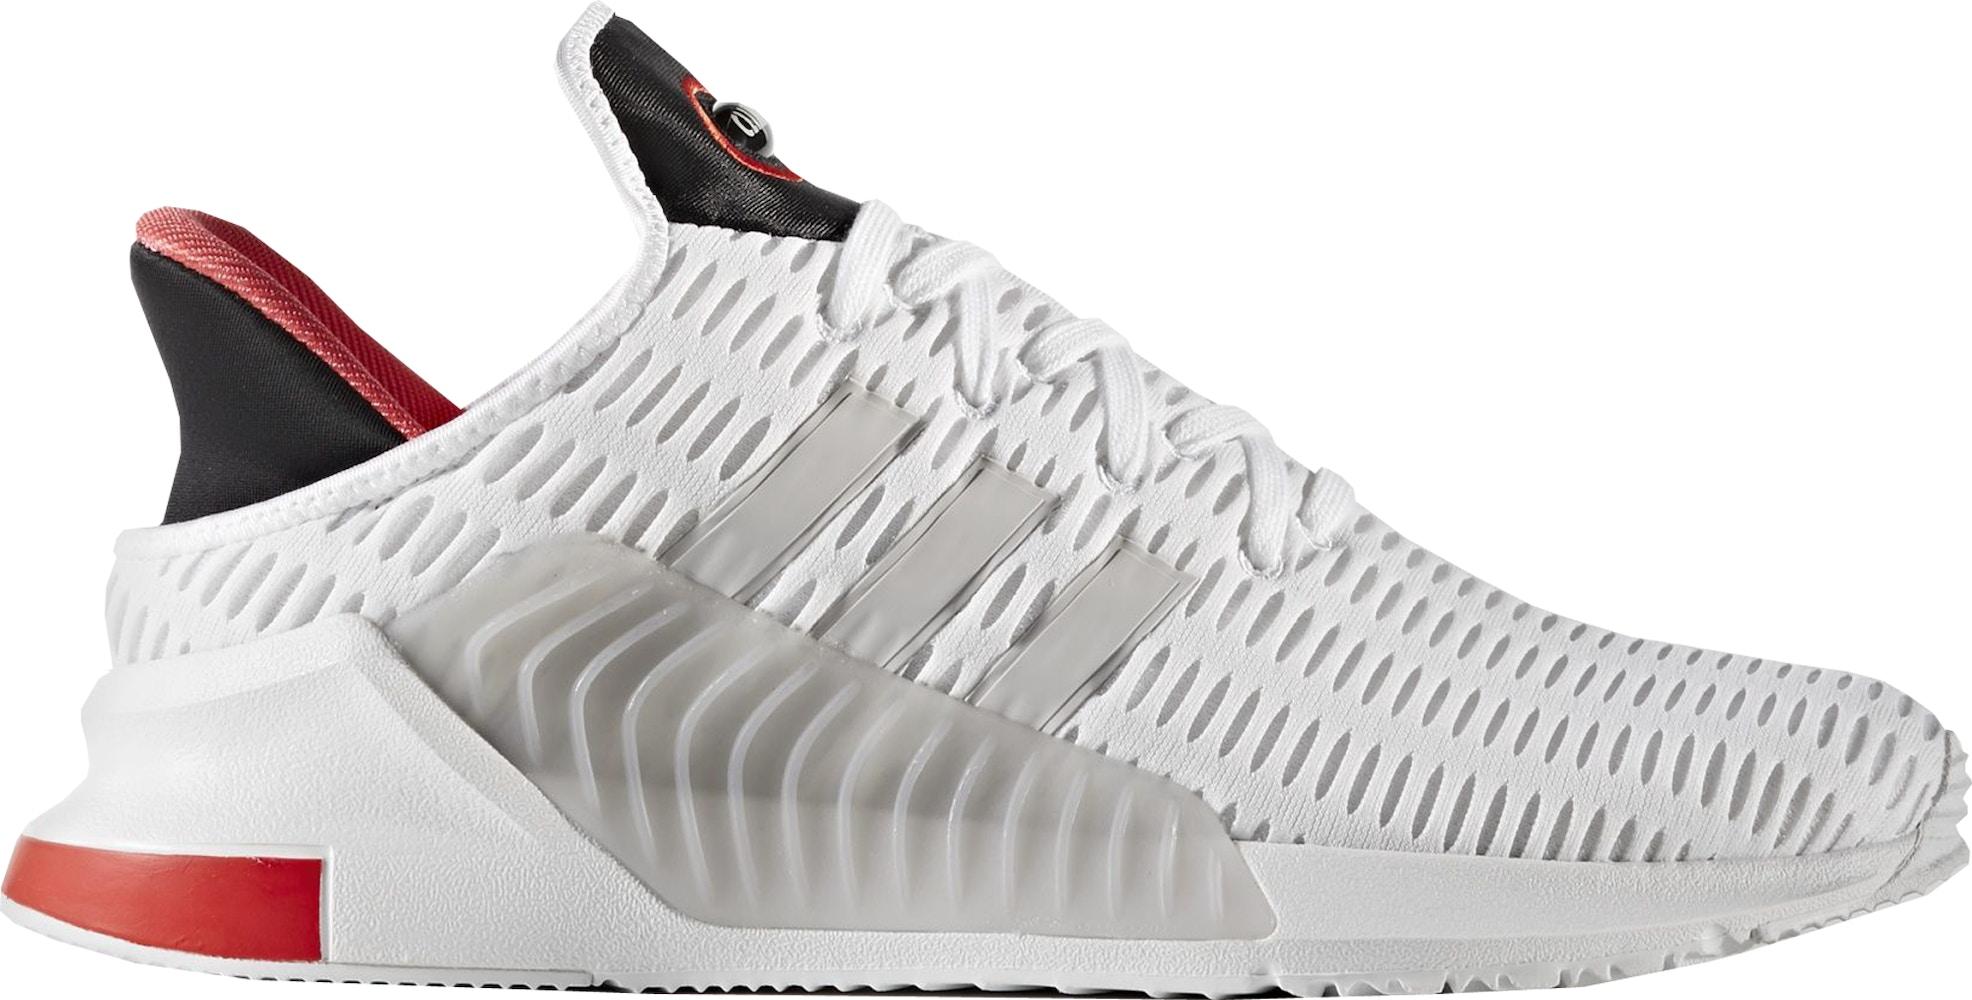 adidas Climacool 02/17 OG White Black Red